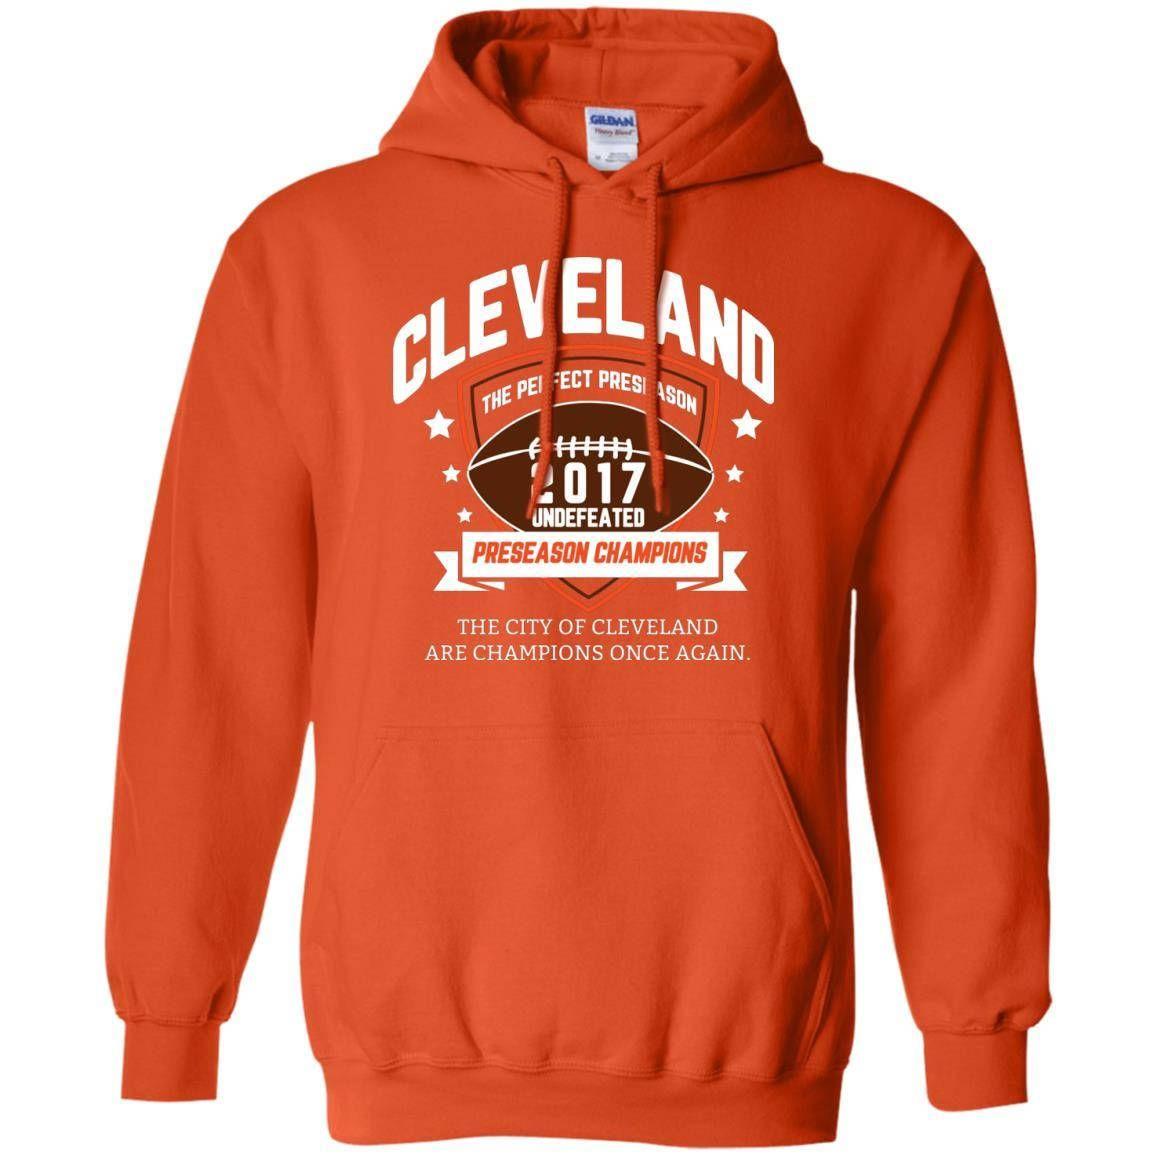 7c6dac50c4ca Cleveland Browns Sweatshirt - Cleveland Browns Preseason Champs - Cleveland Browns  Undefeated - Browns 2017 Preseason